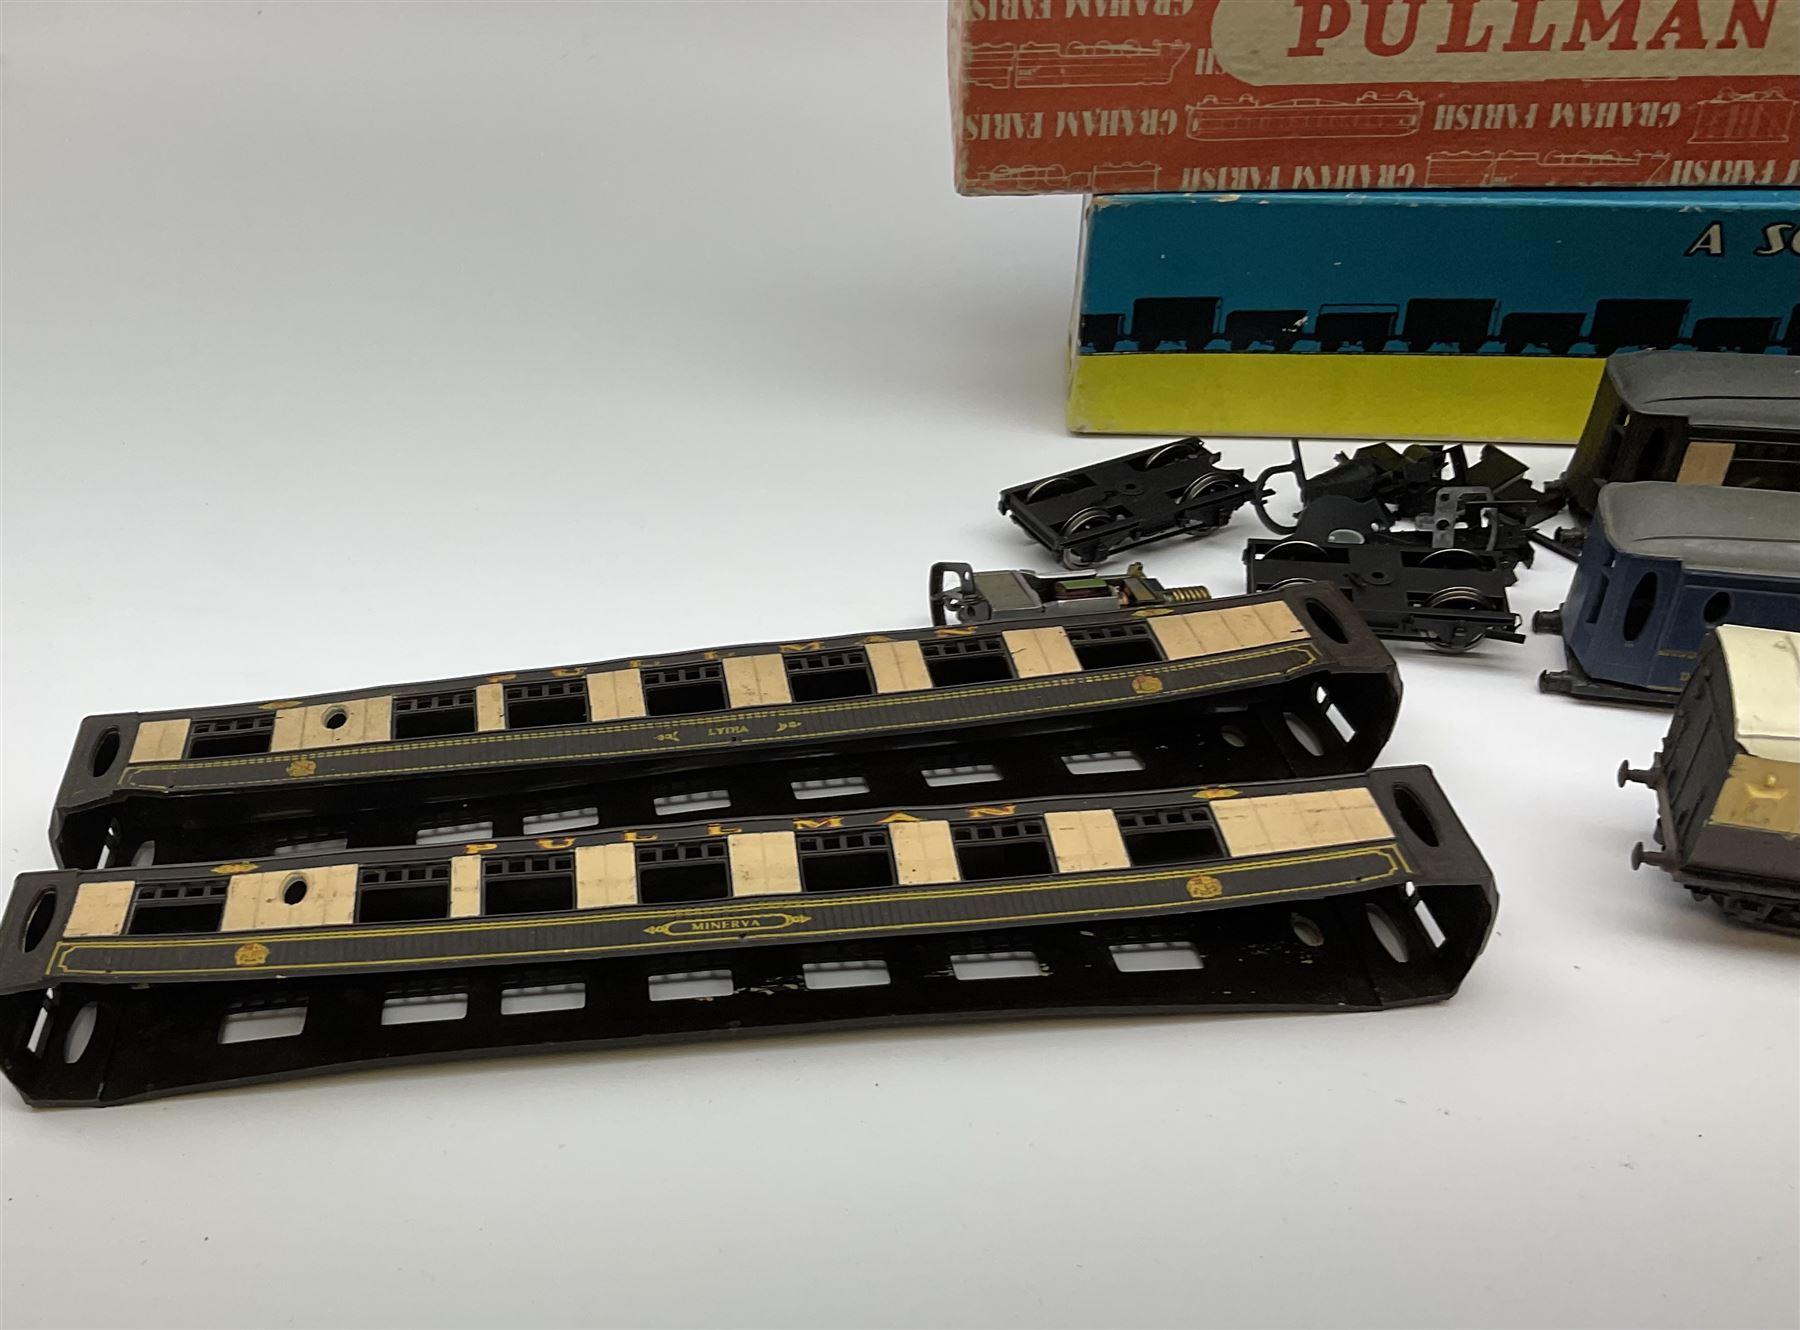 Graham Farish '00' gauge - six Pullman dining/brake dining cars - Image 7 of 8